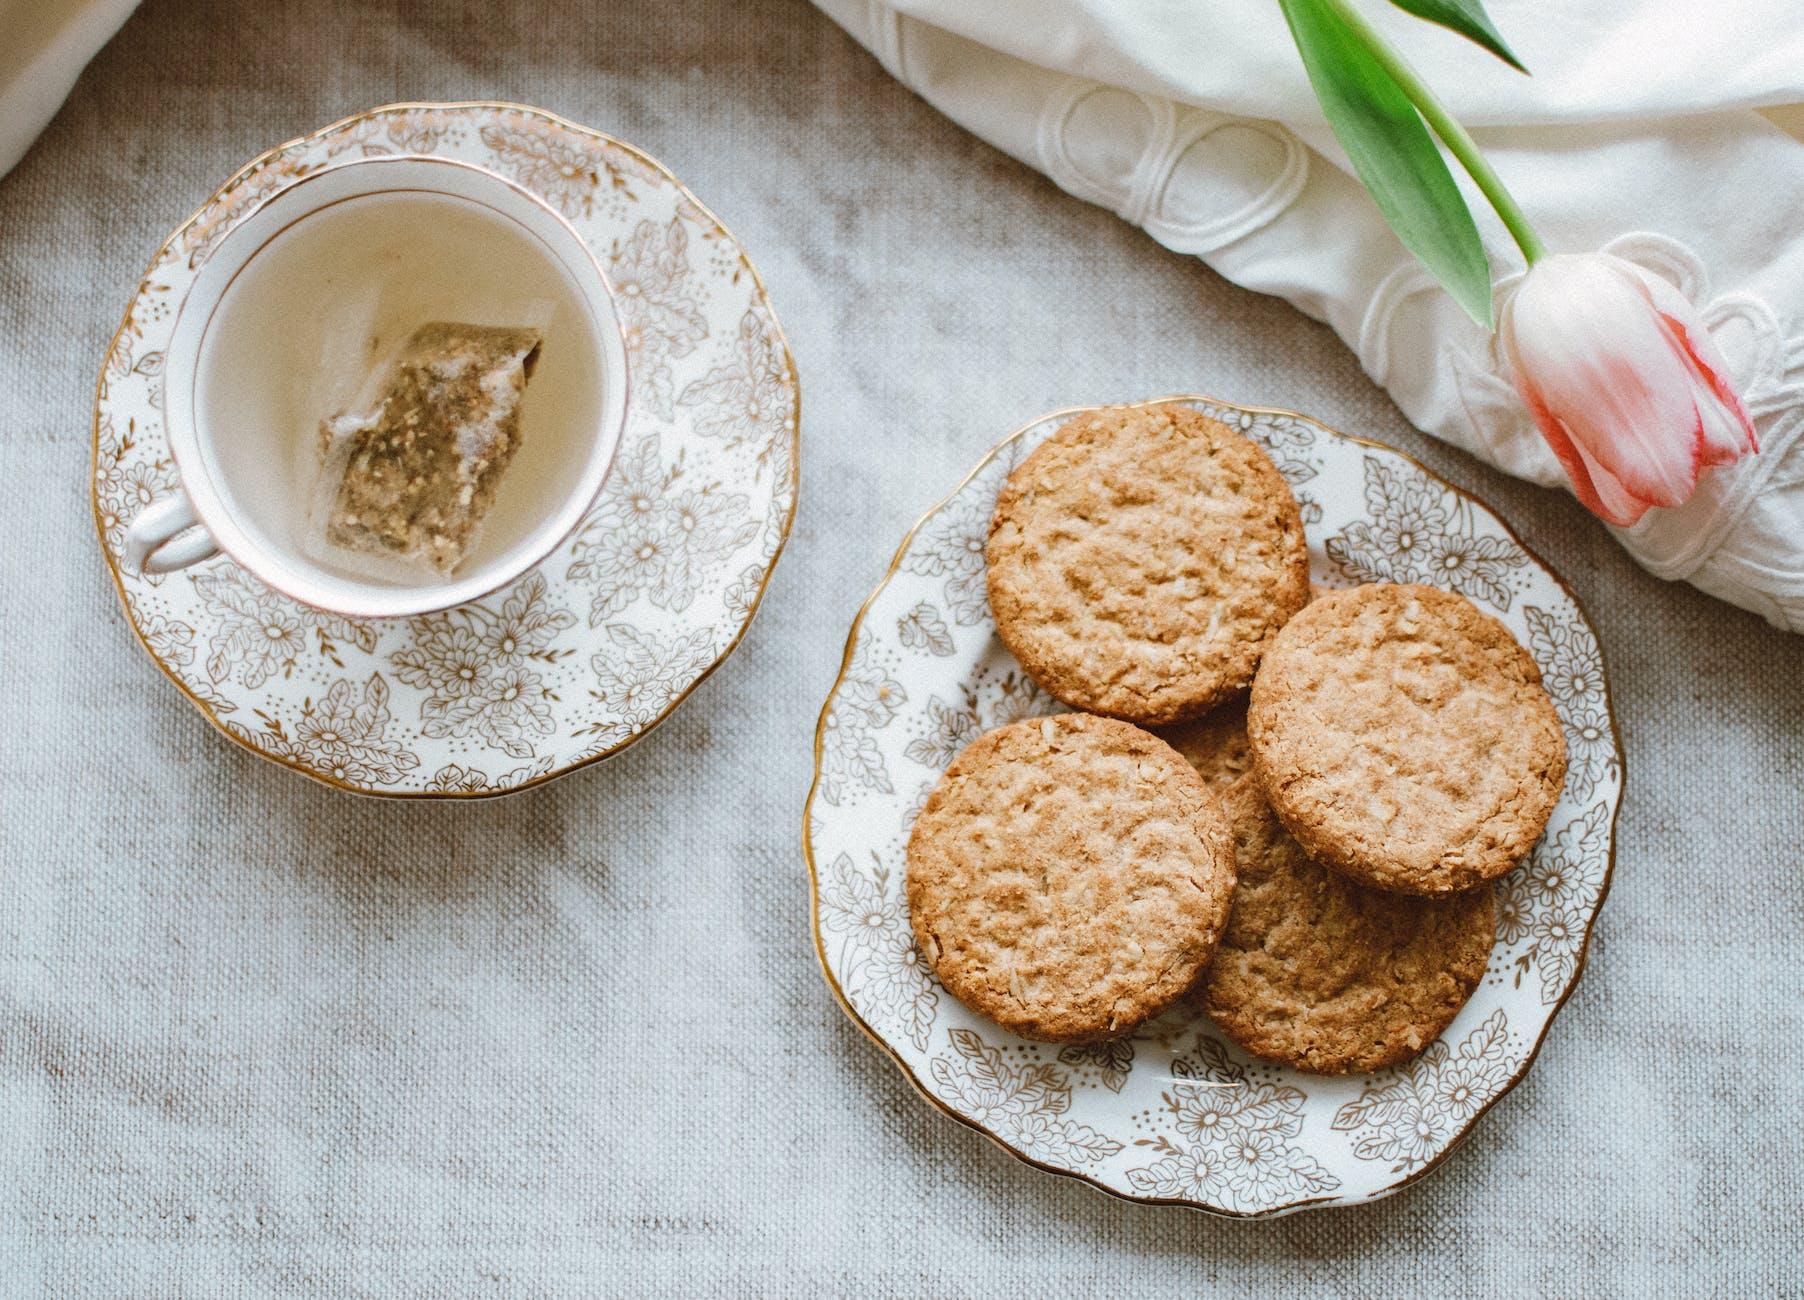 round cookies on bowl beside teacup